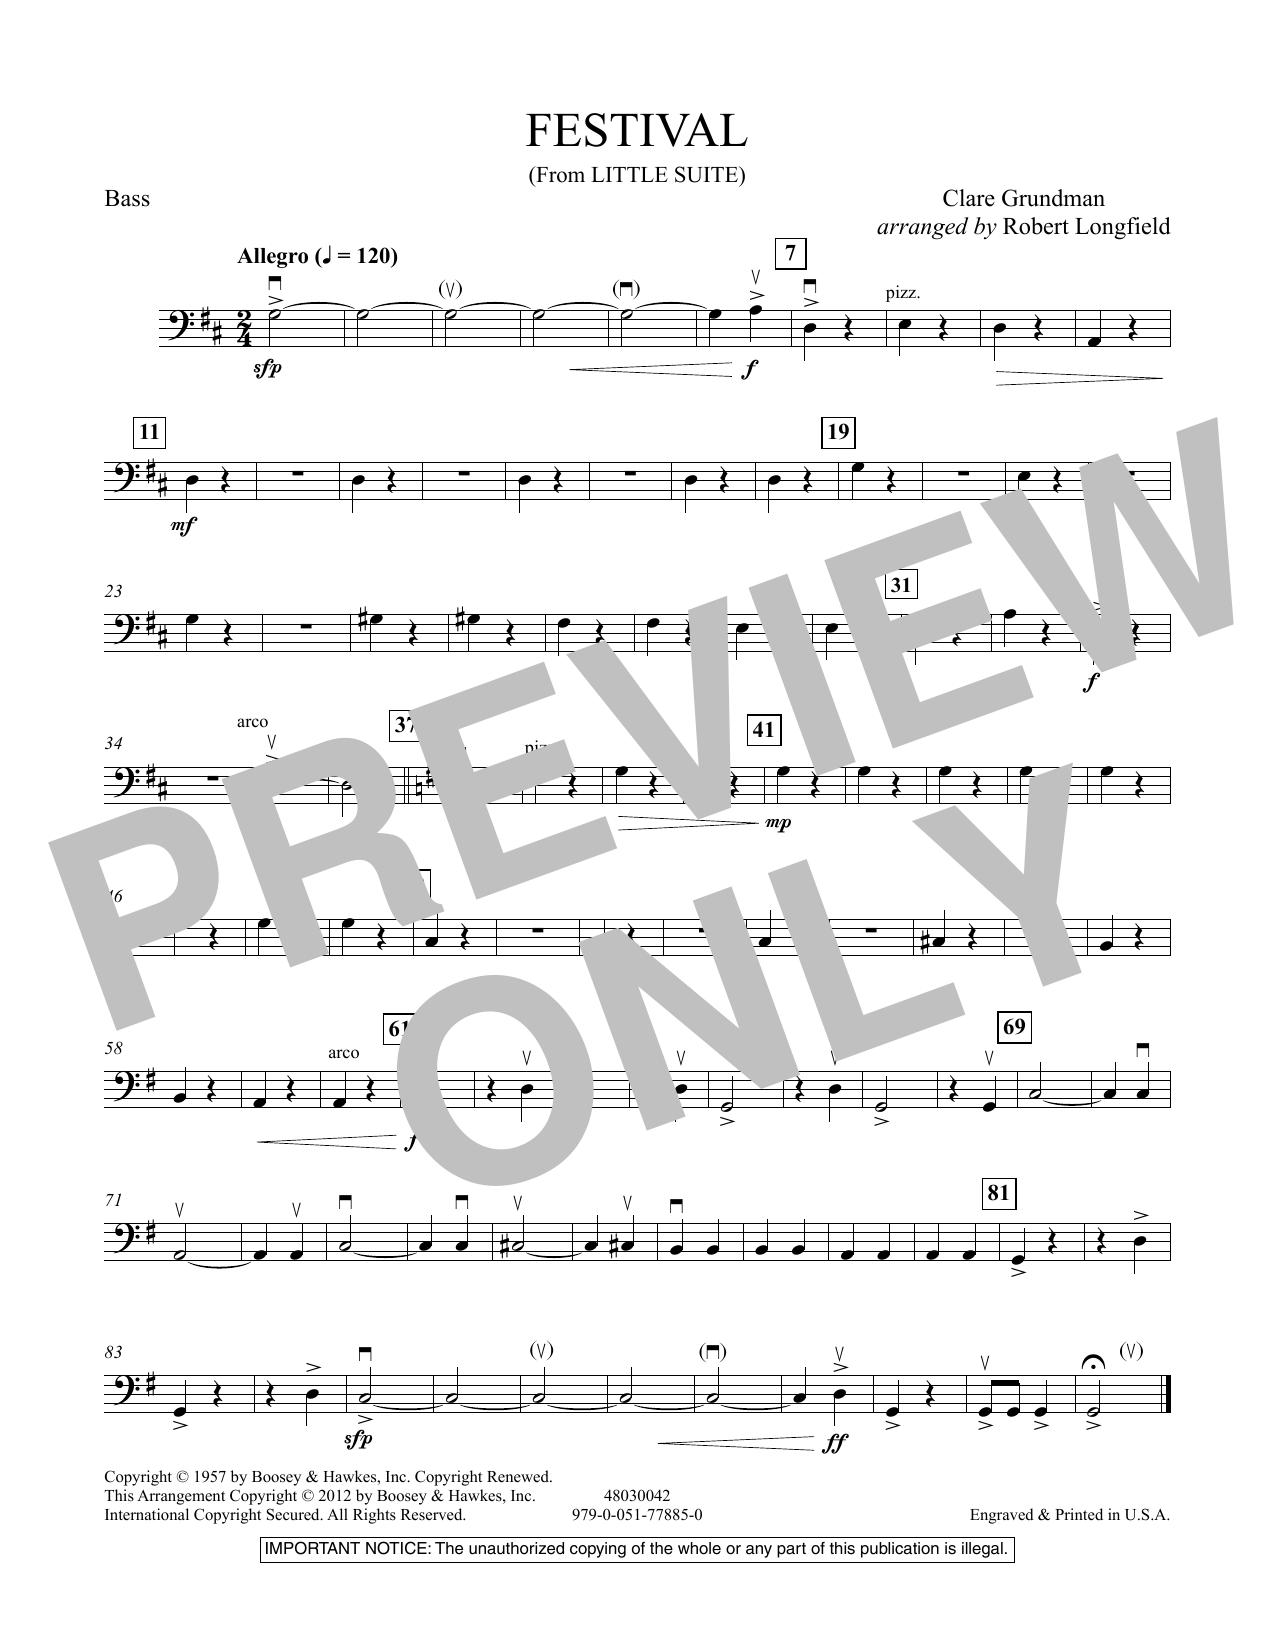 Festival (from Little Suite) - Bass Sheet Music